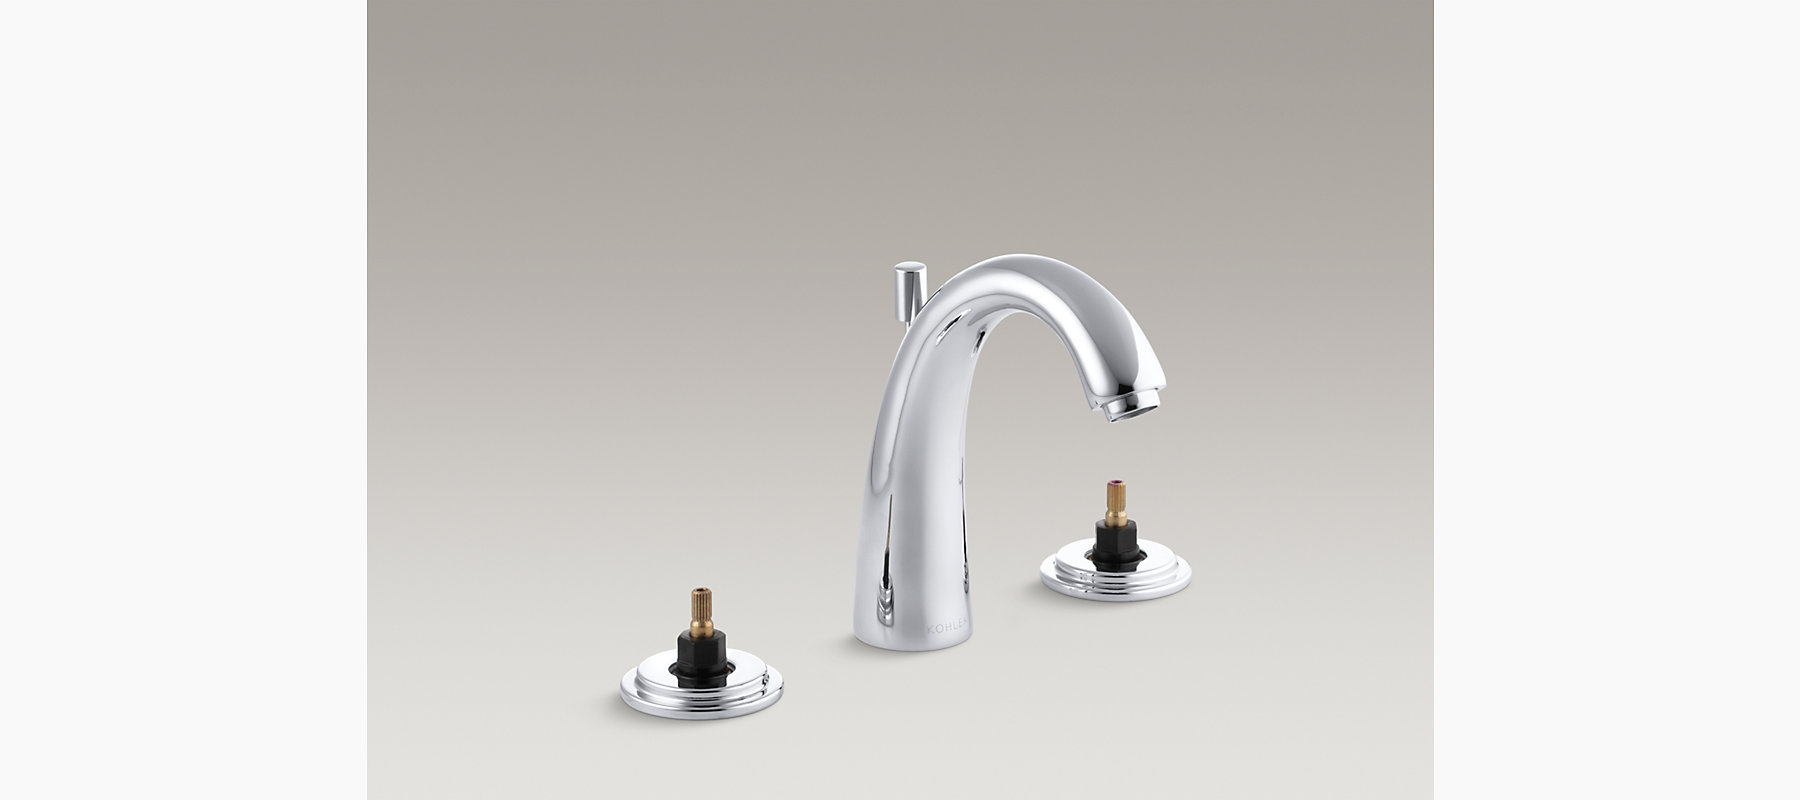 Taboret Widespread Sink Base Faucet With Escutcheons KK - Discontinued kohler bathroom sink faucets